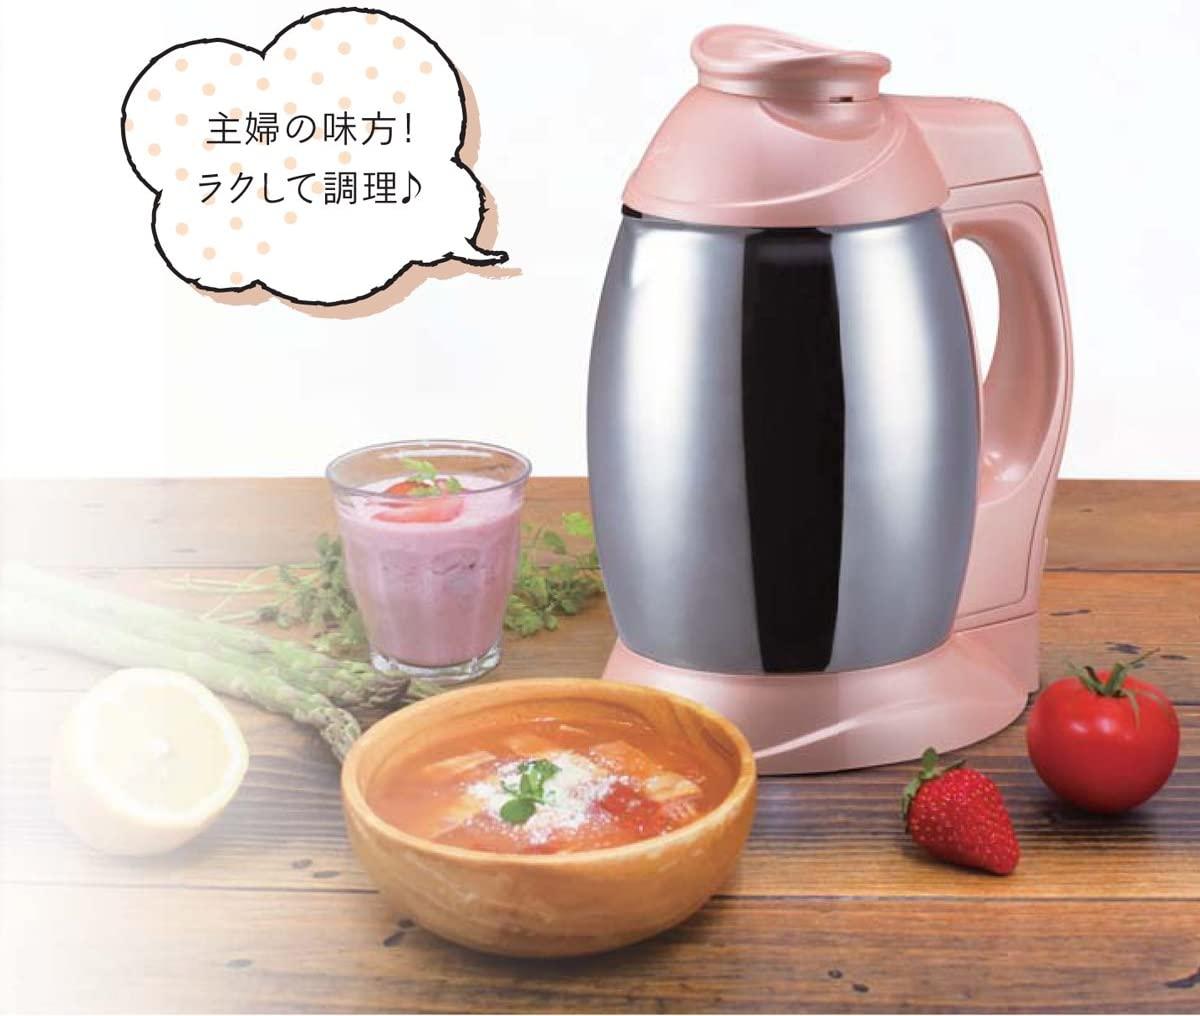 APIX(アピックス) 豆乳&スープメーカー ASM-294の商品画像11